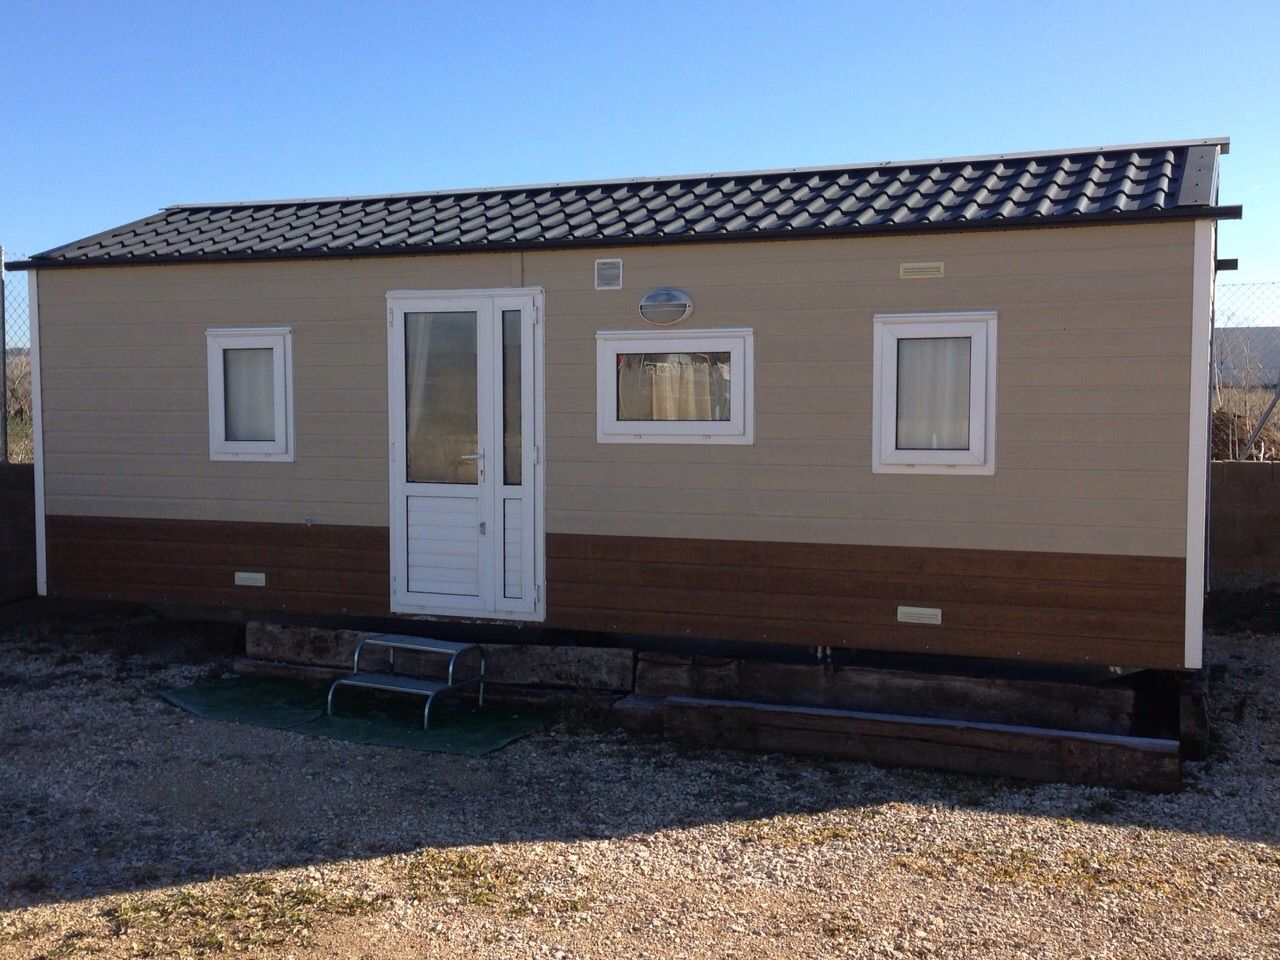 Casas prefabricadas hipotecables para fincas urbanas - Casas prefabricadas moviles ...